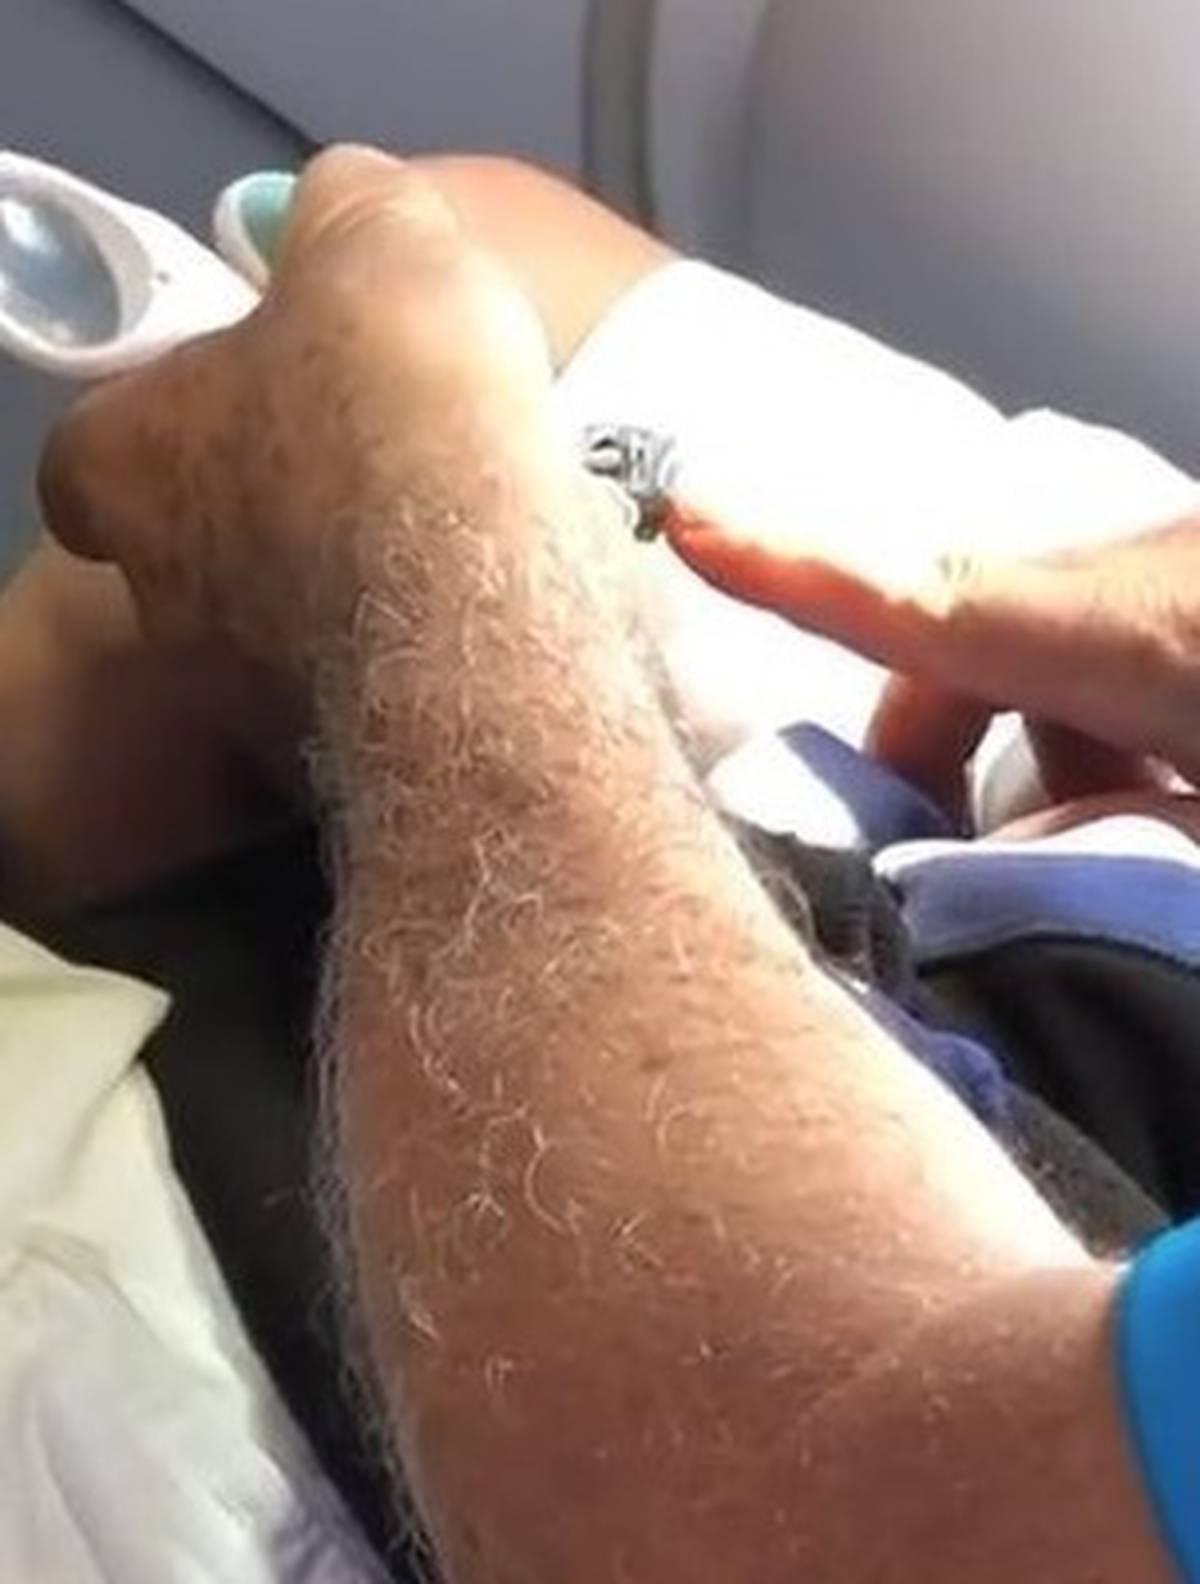 Passenger shaming: traveller filmed clipping nails before take-off